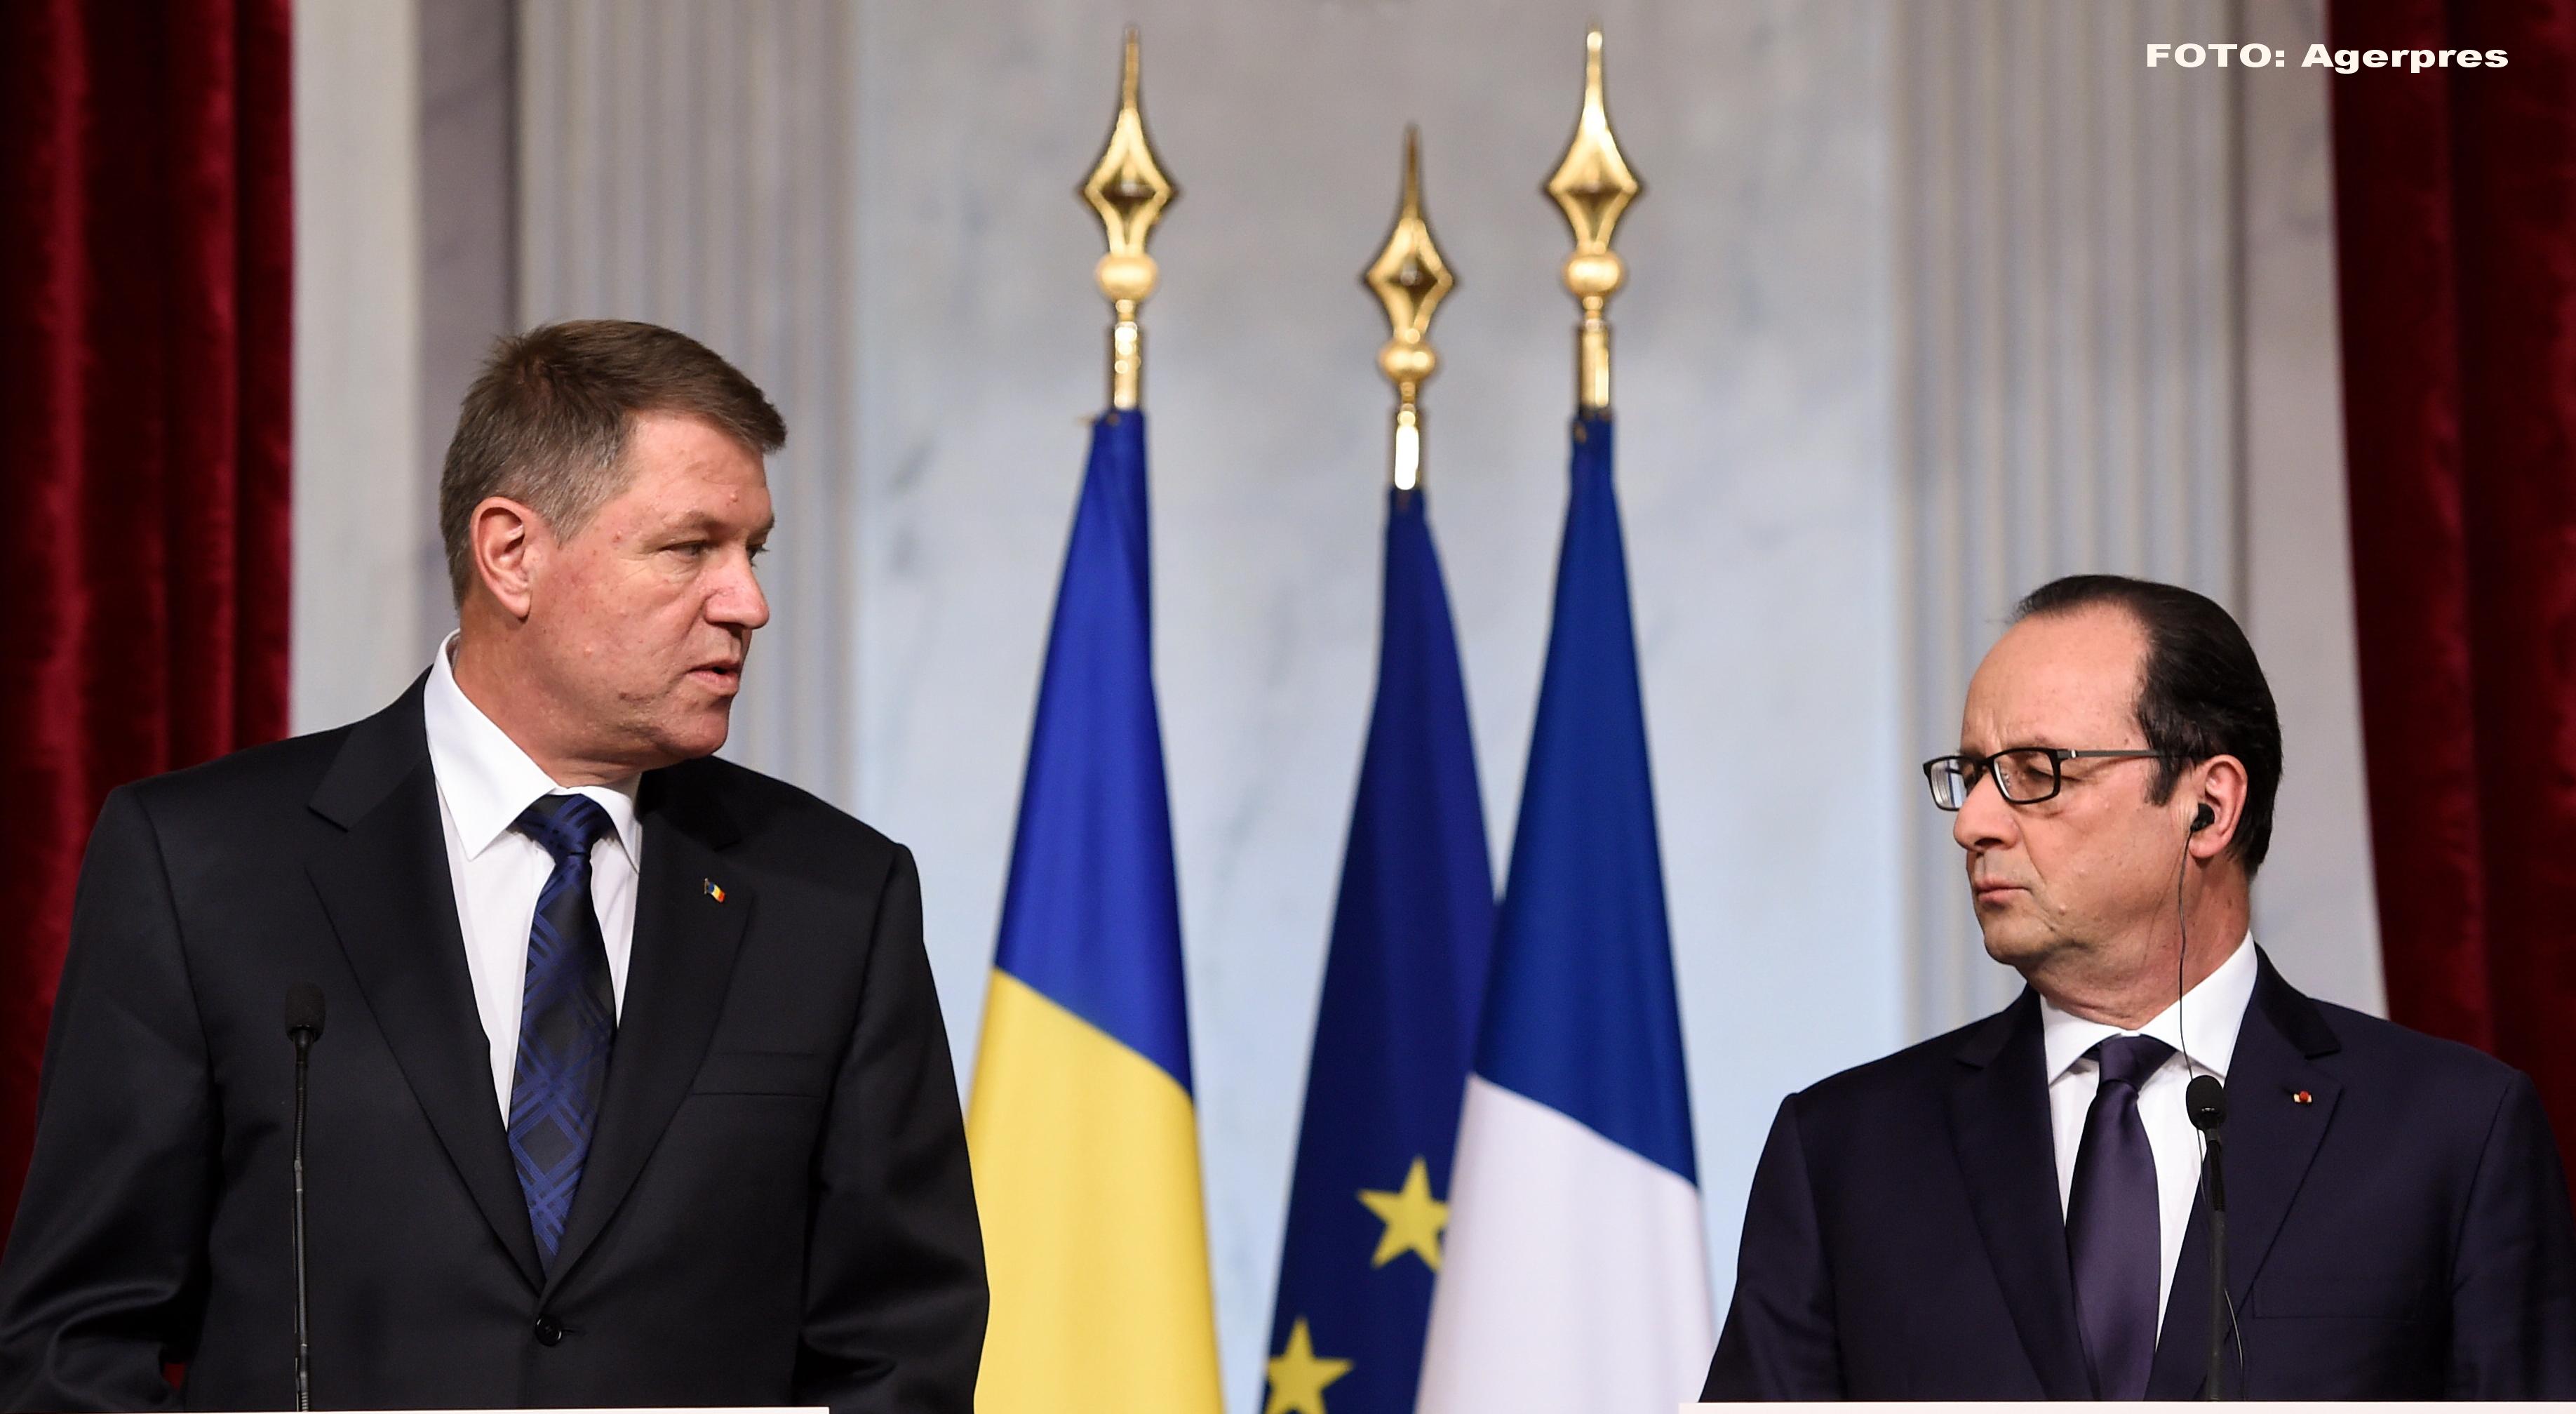 Presedintele Frantei, Francois Hollande, vine in Romania, intr-o vizita oficiala. Ce program i-a pregatit Klaus Iohannis